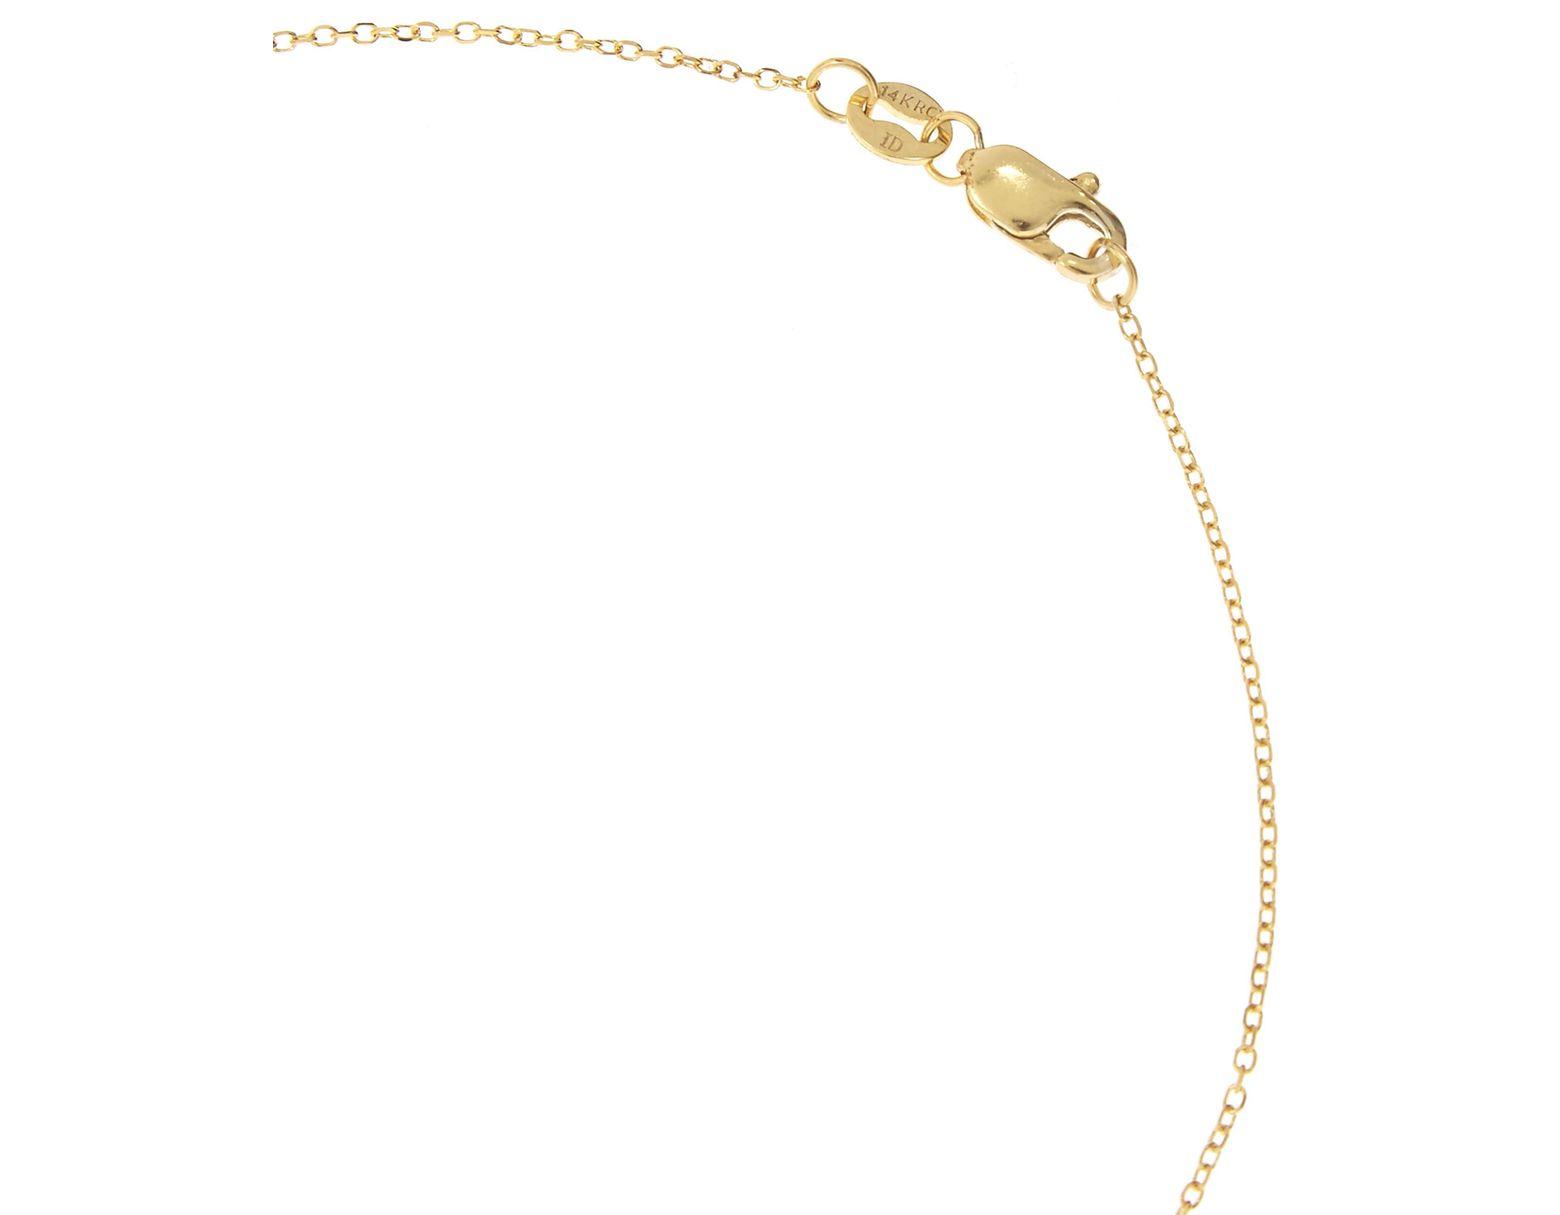 de899b91ed651 Women's Metallic Gold And Diamond Letter Y Disc Pendant Necklace